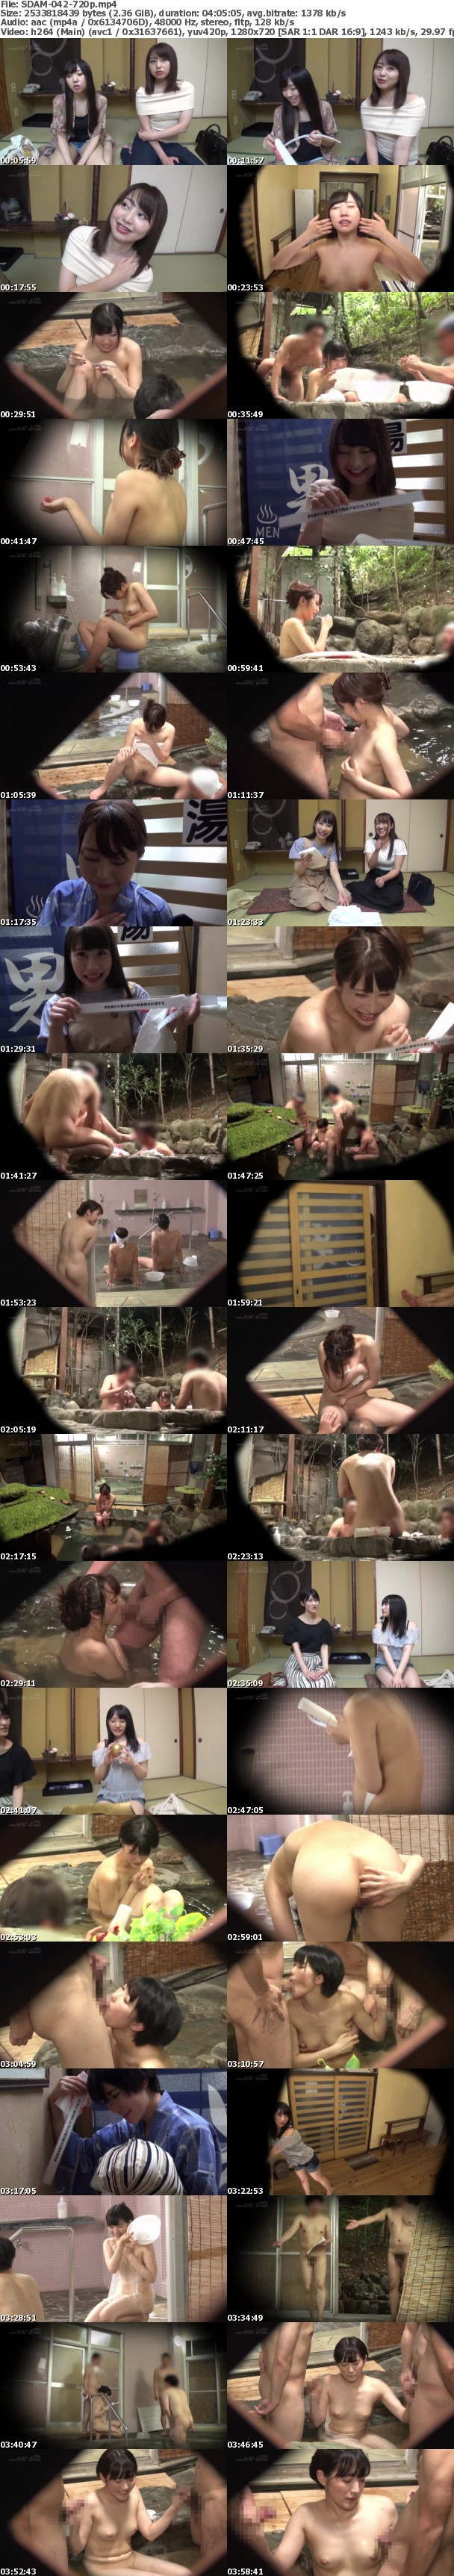 (HD) SDAM-042 伊豆長岡温泉で見つけた美人女子大生 タオル一枚 男湯入ってみませんか? 羞恥ミッション「男性客に身体の大事な部分をスケッチしてもらう!」&特別ミッション「男性客のあそこの湯しずくを全部舐め取ってあげる」で美乳女子に暴発射精 合計17発SP!!